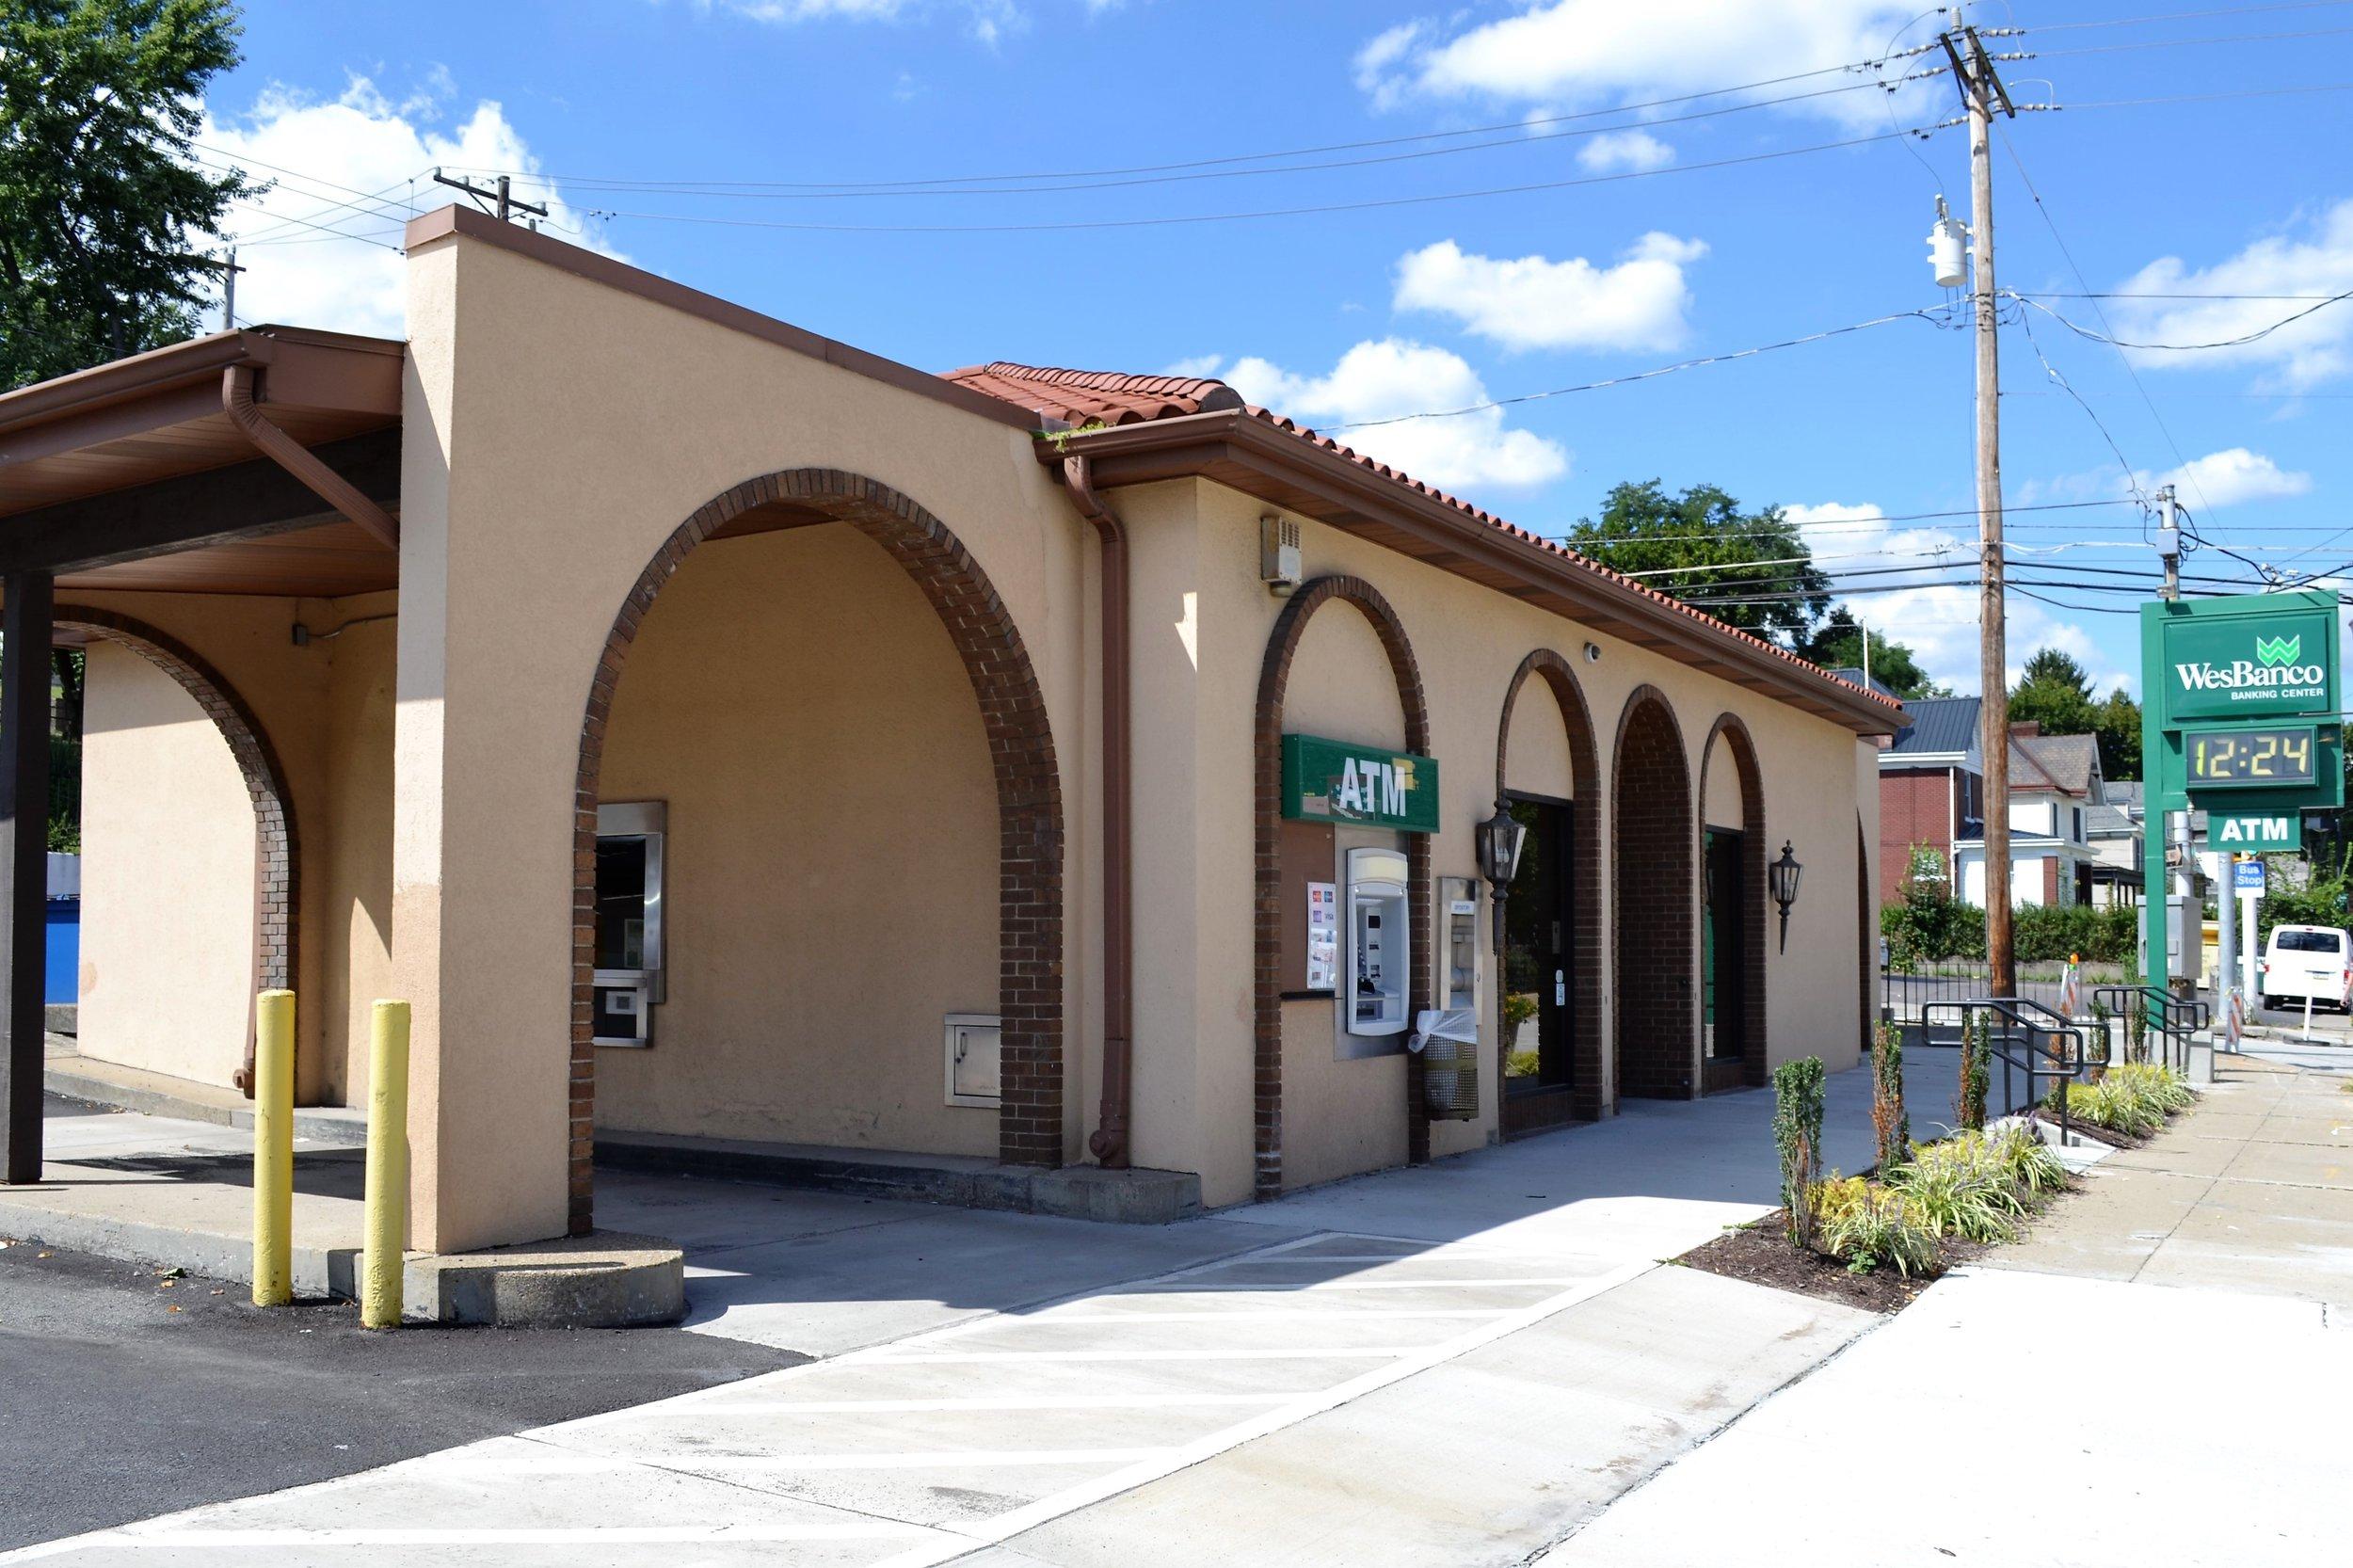 WesBanco - 900 5th Ave, (412) 264-8862